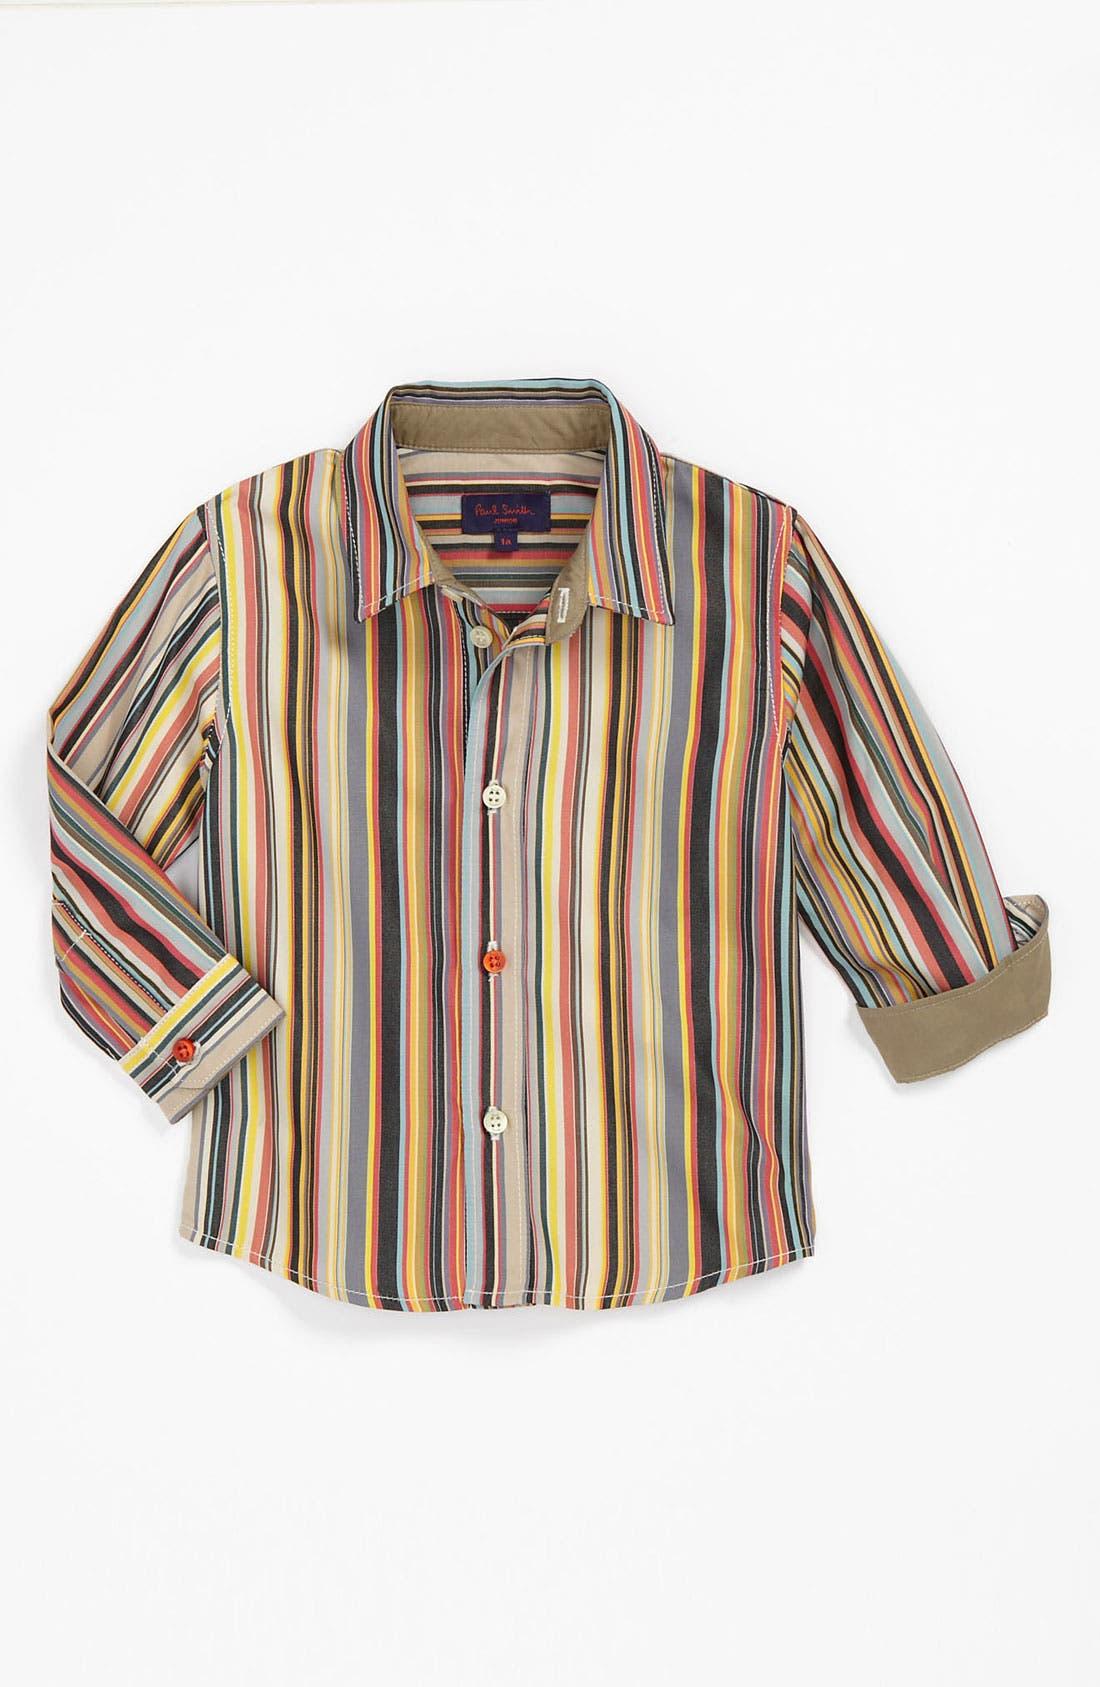 Alternate Image 1 Selected - Paul Smith Junior Stripe Dress Shirt (Baby)